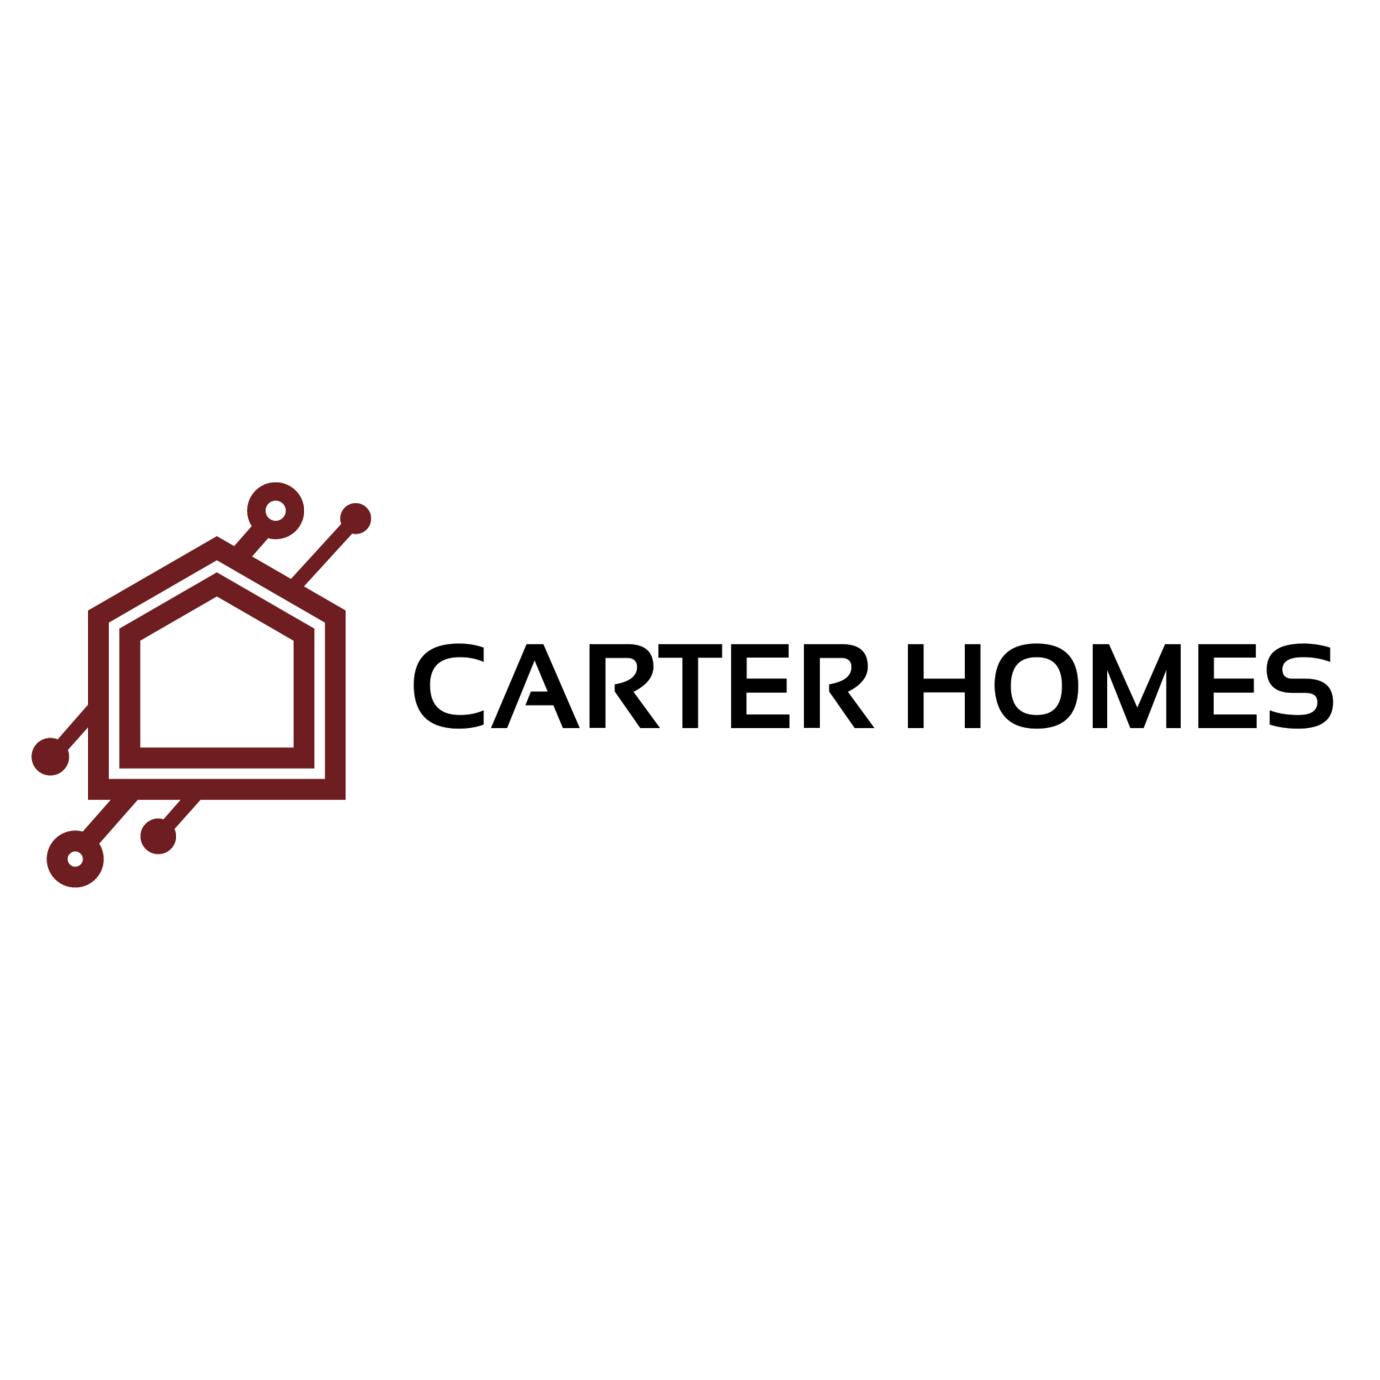 Carter Homes TX - Twelve Realty Logo